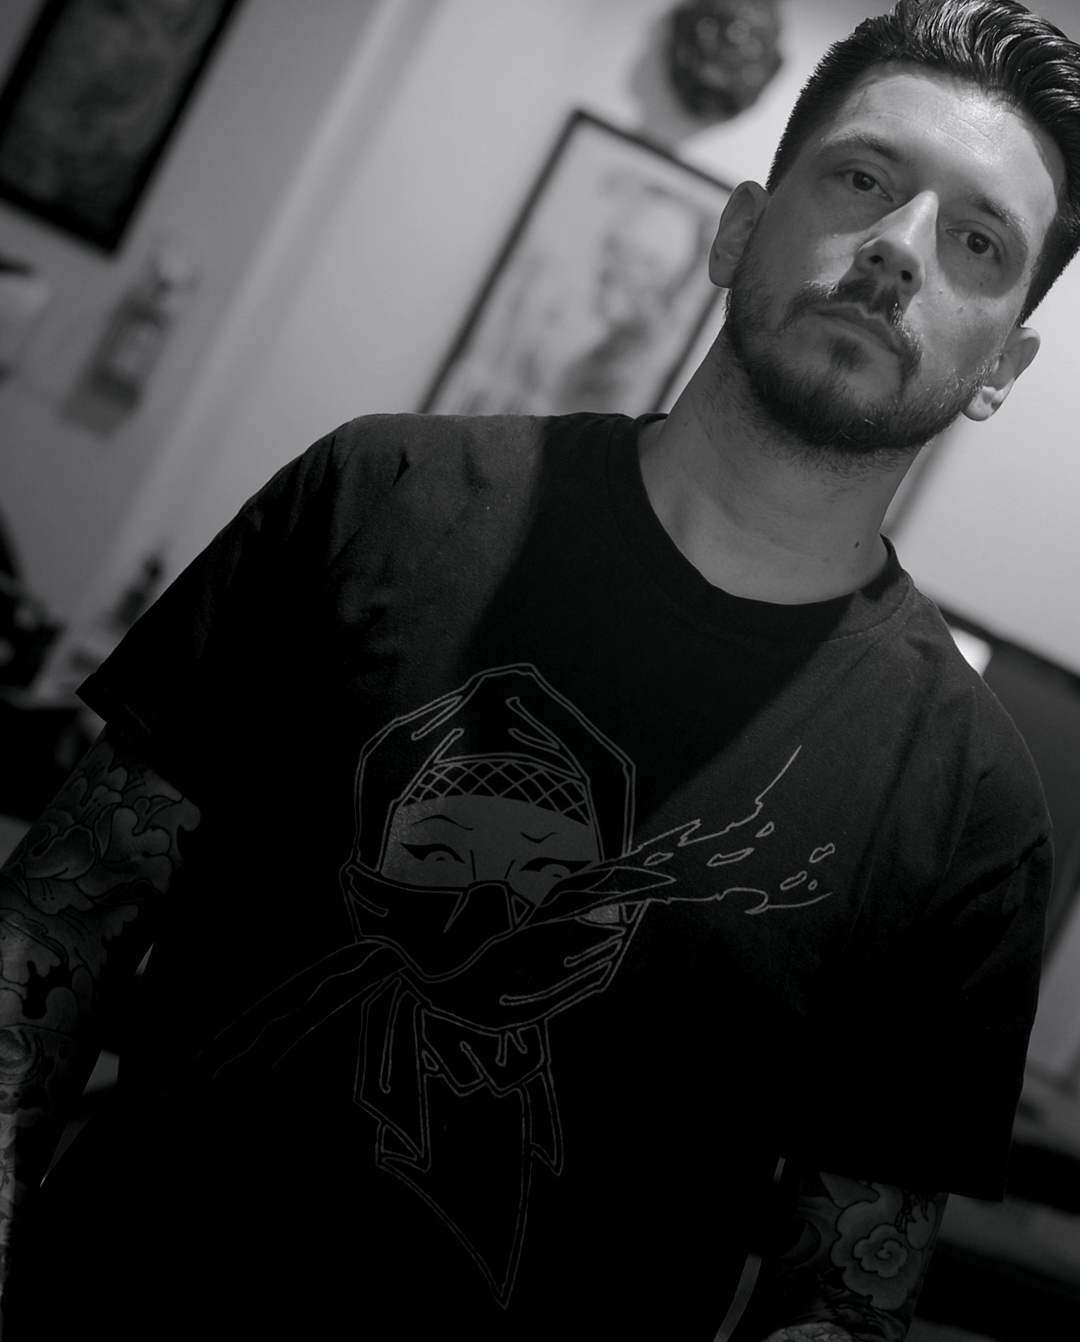 emil-klein-tattoo-groningen-custom-tattooing